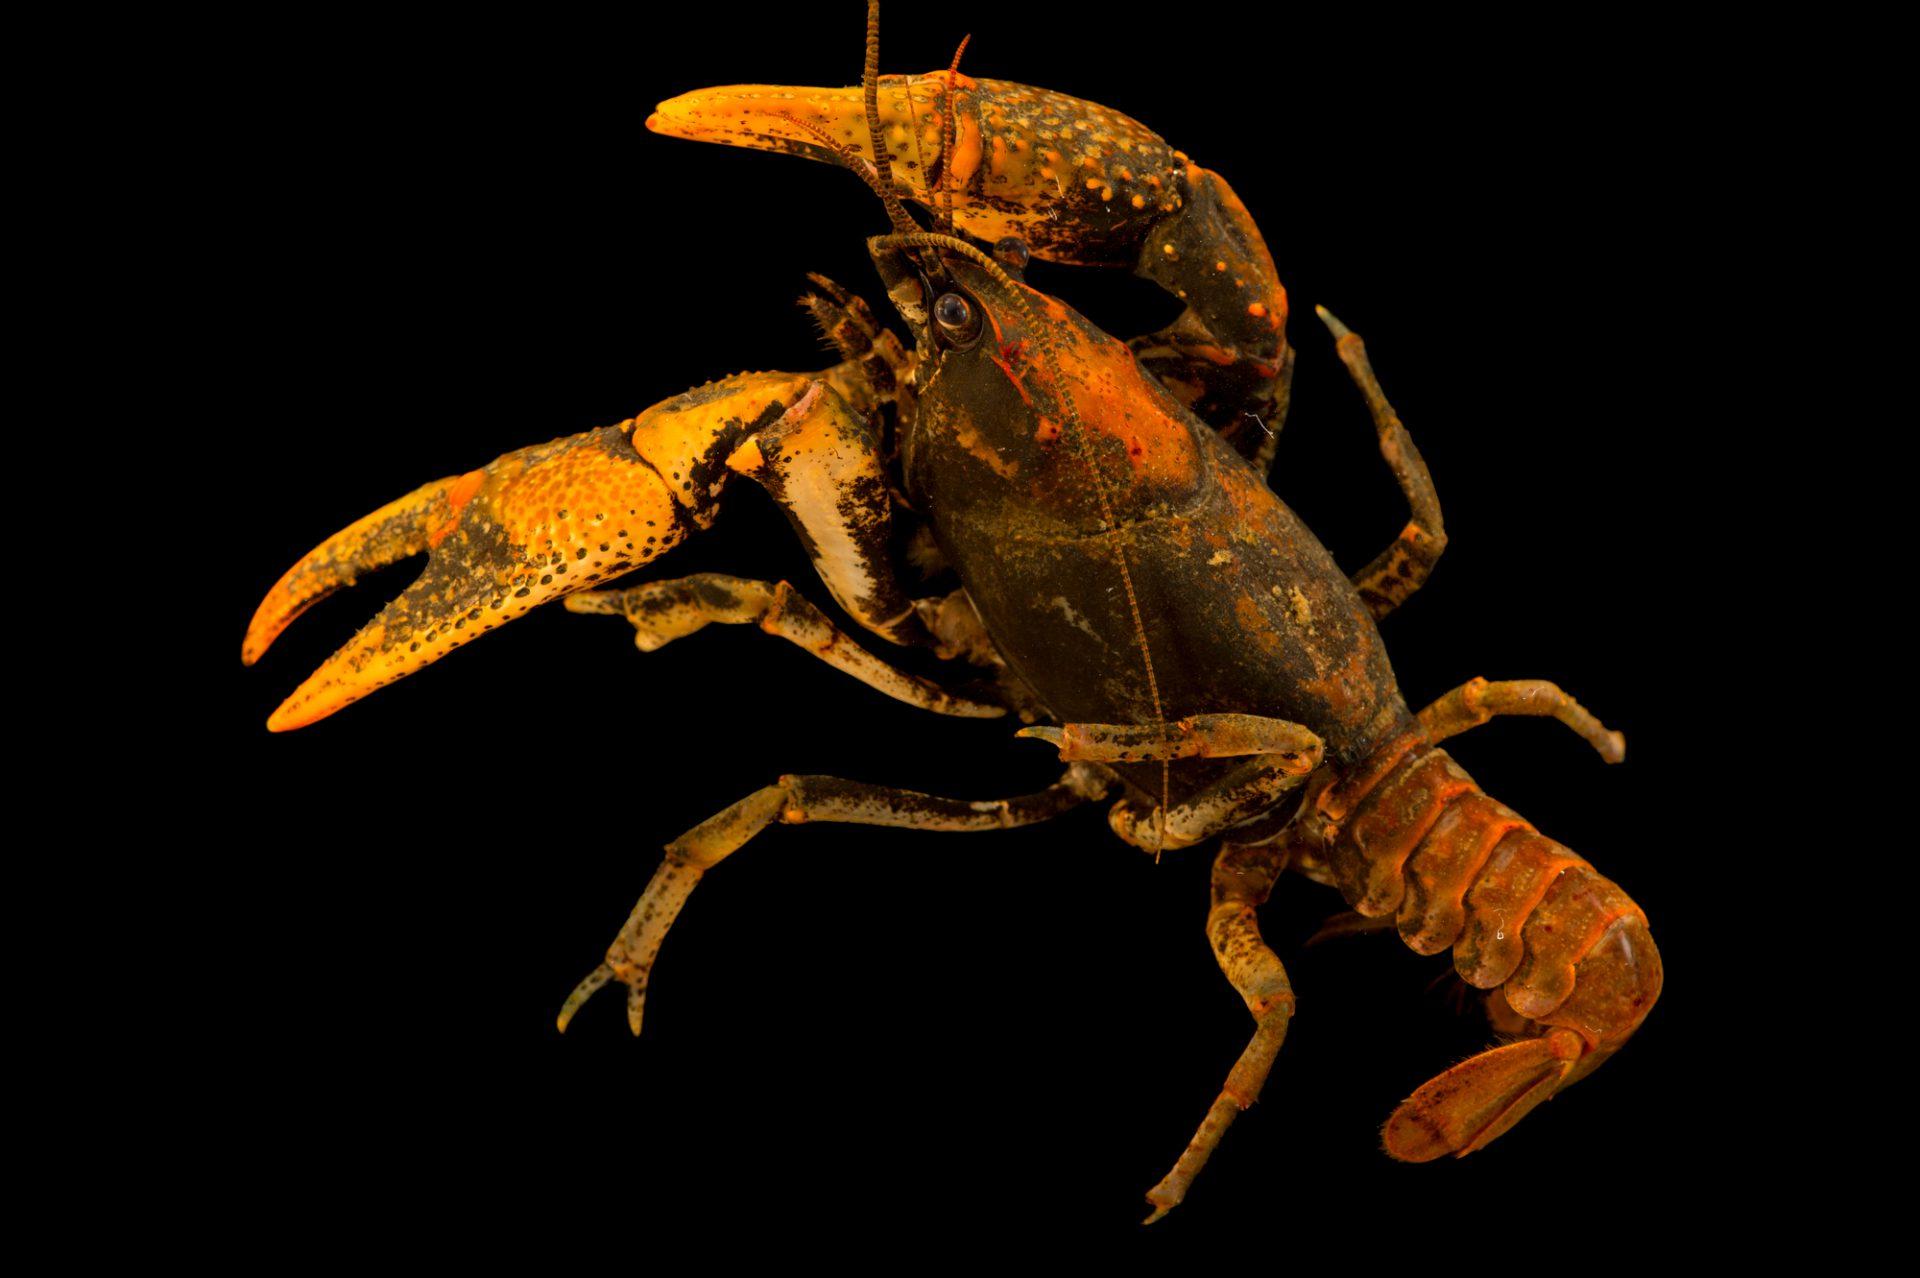 Photo: A little brown mudbug, Cambarus thomai, wild caught near Sulphur Wells, Kentucky.